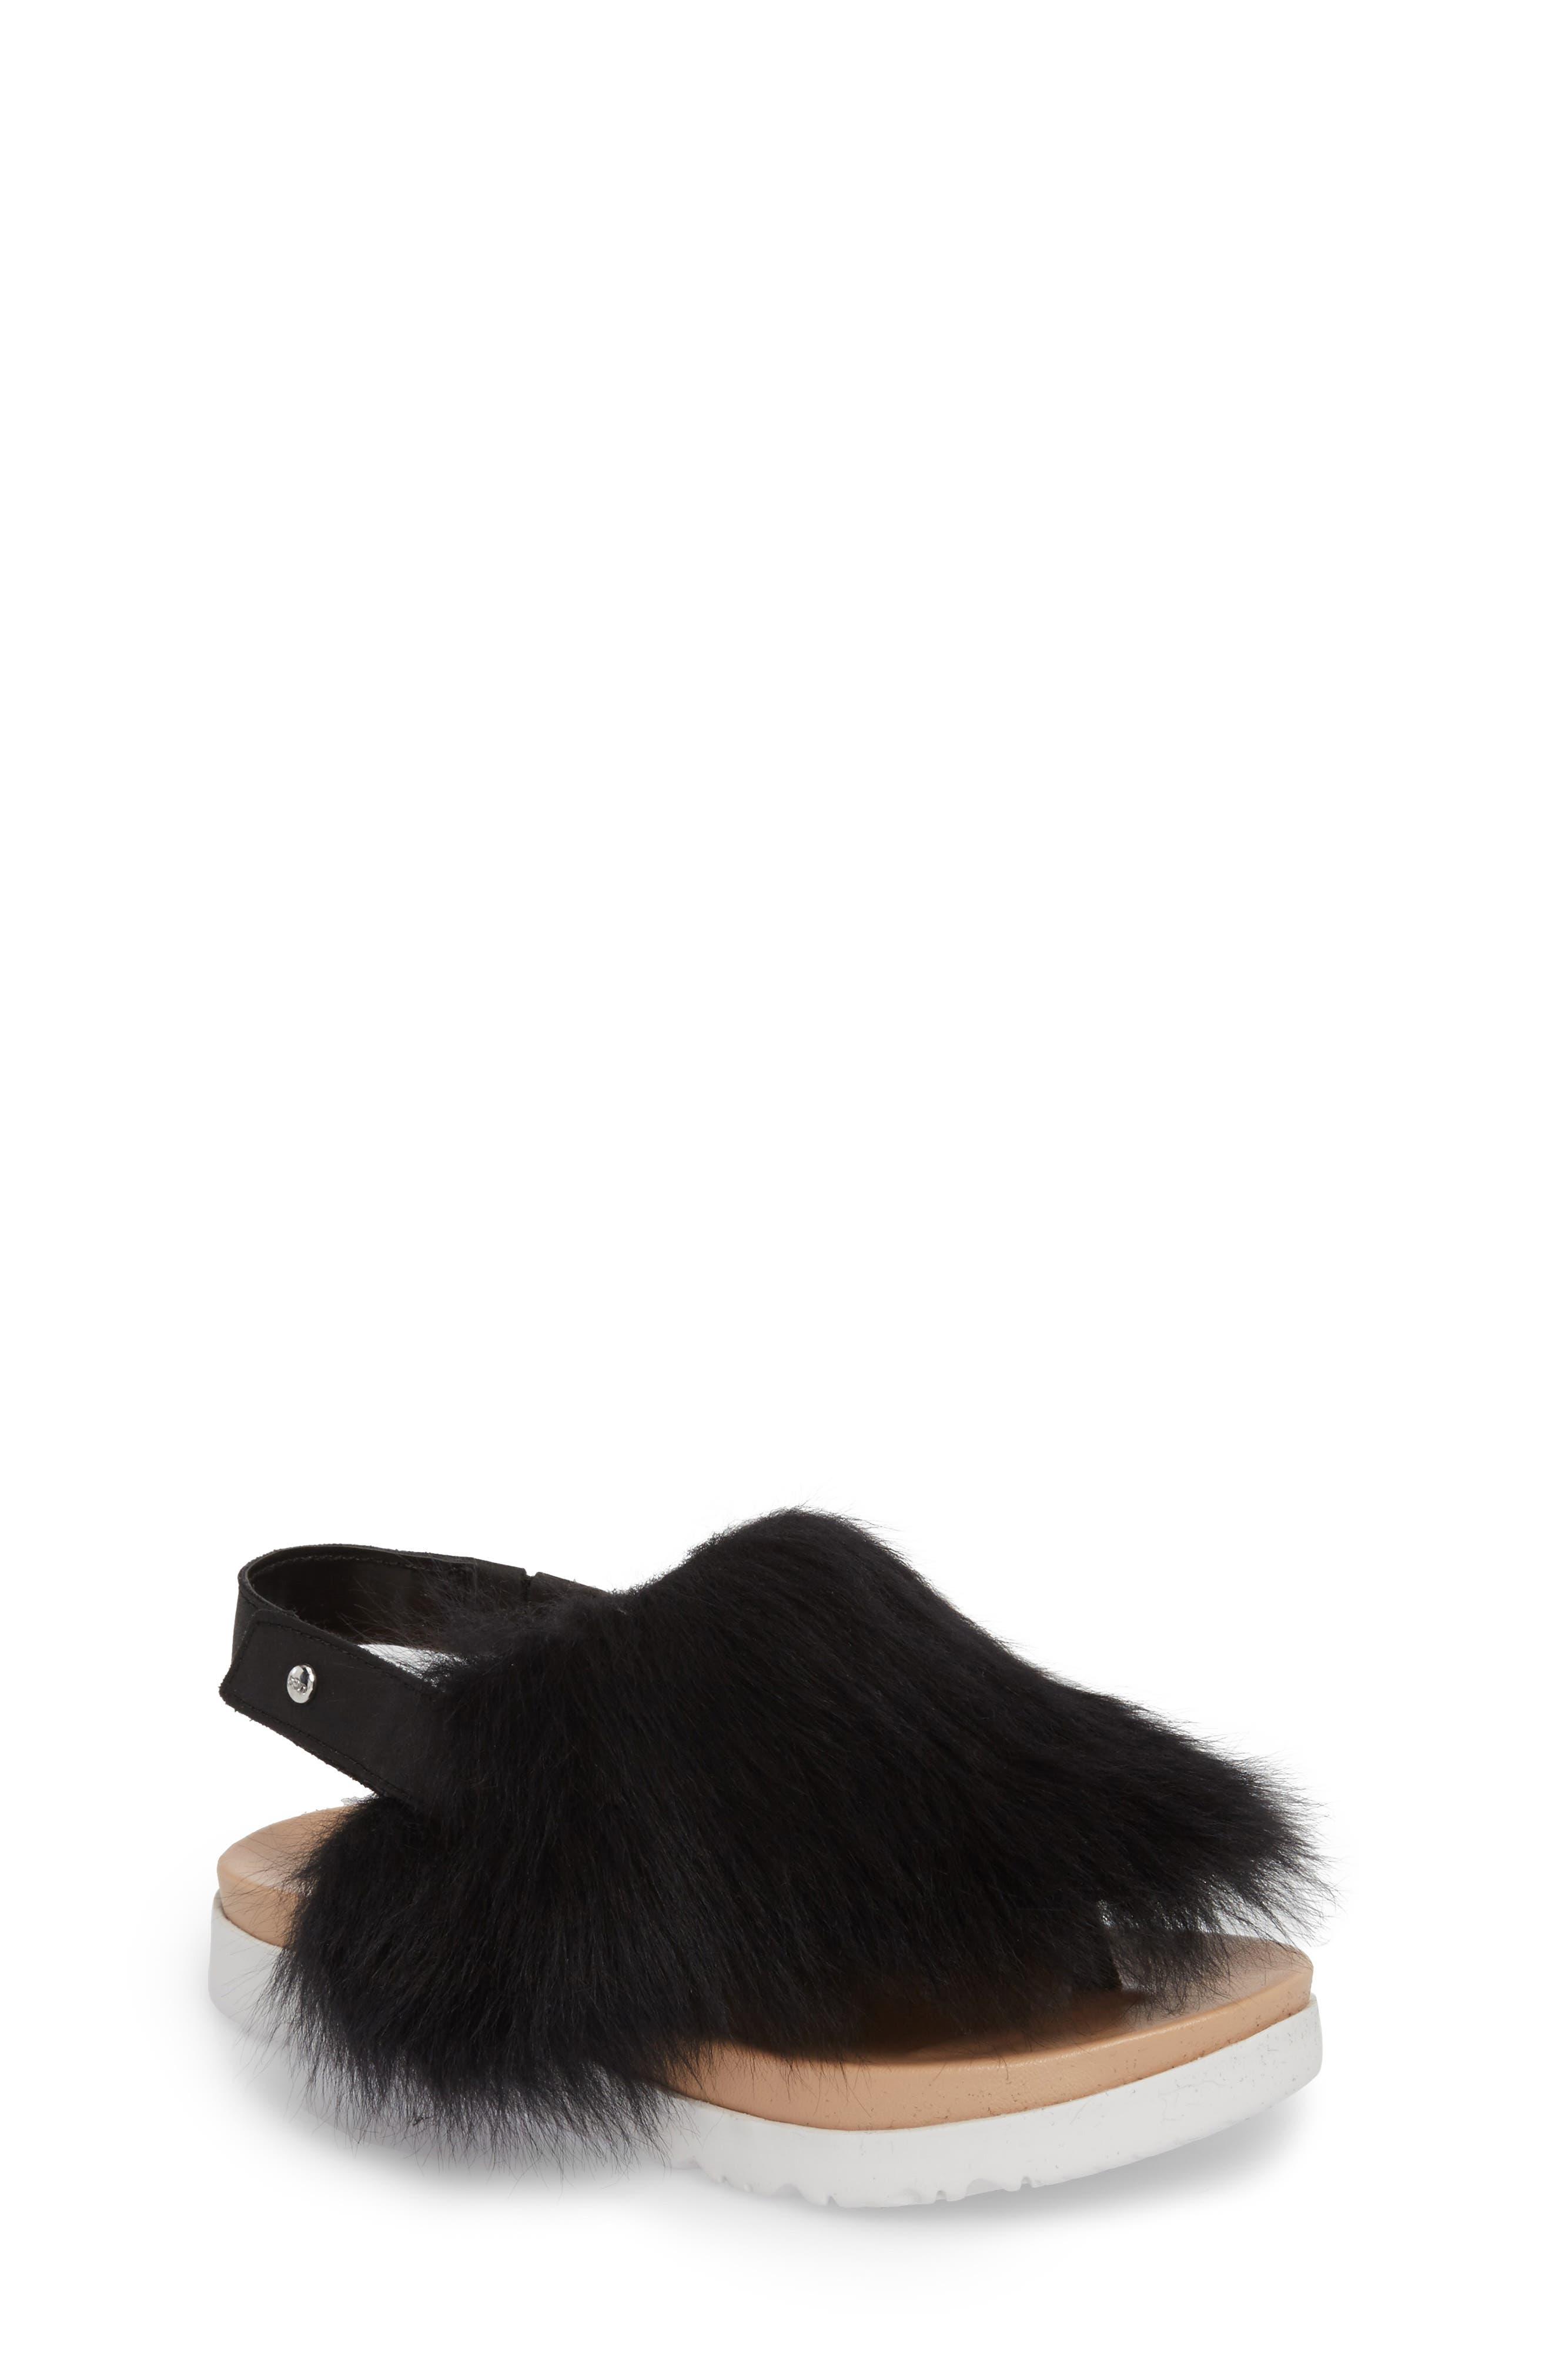 Holly Genuine Shearling Sandal,                             Main thumbnail 1, color,                             001